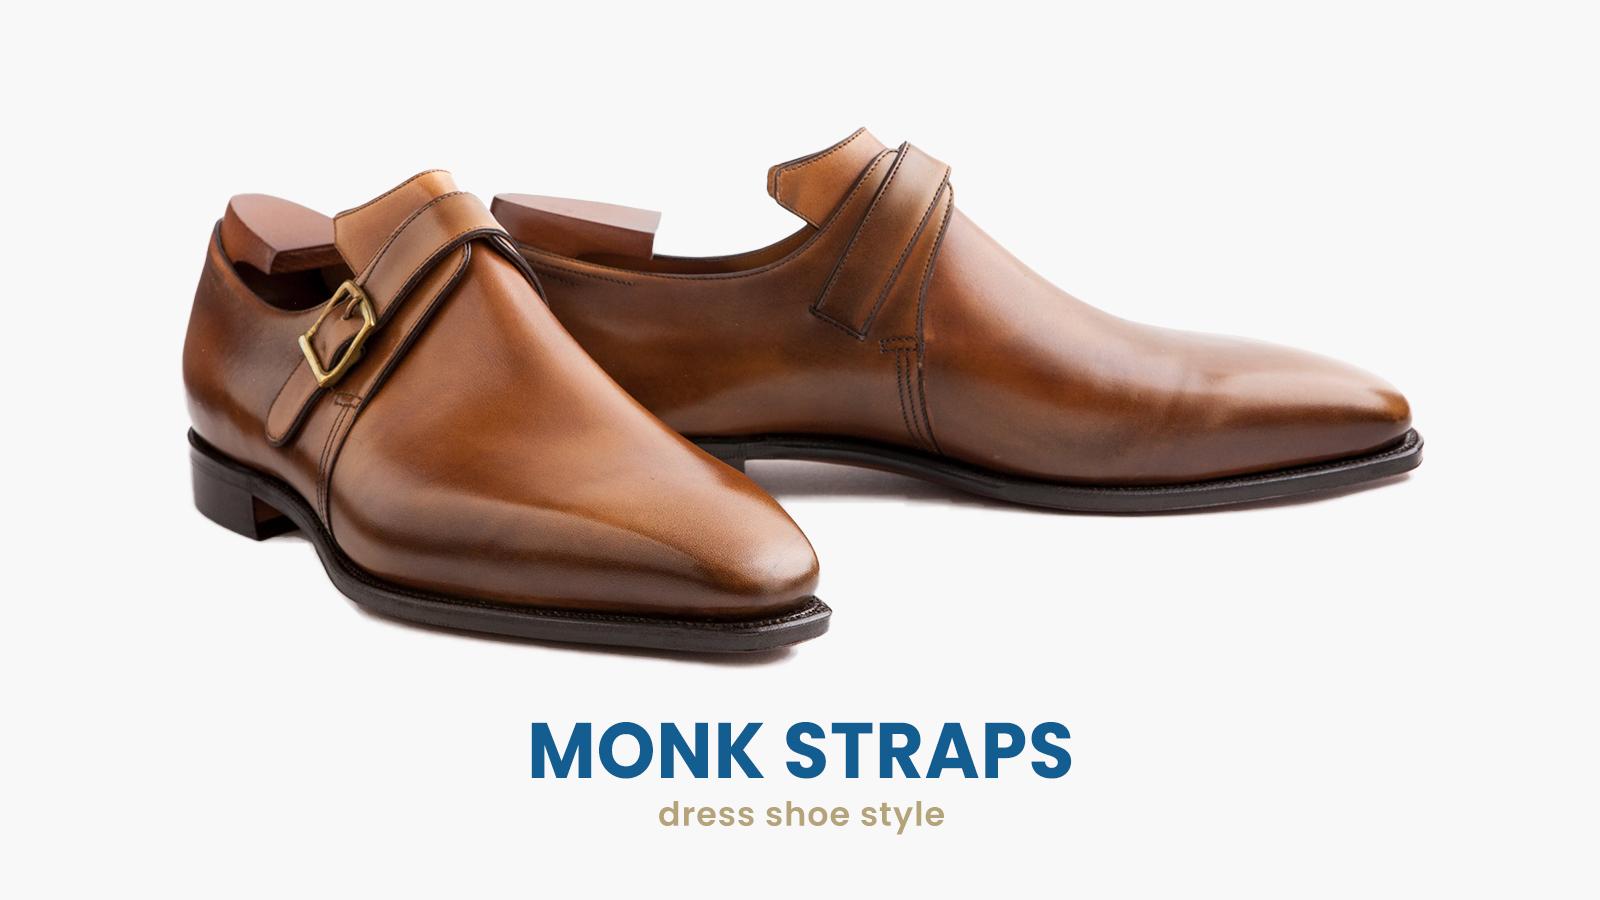 monk straps dress shoes style